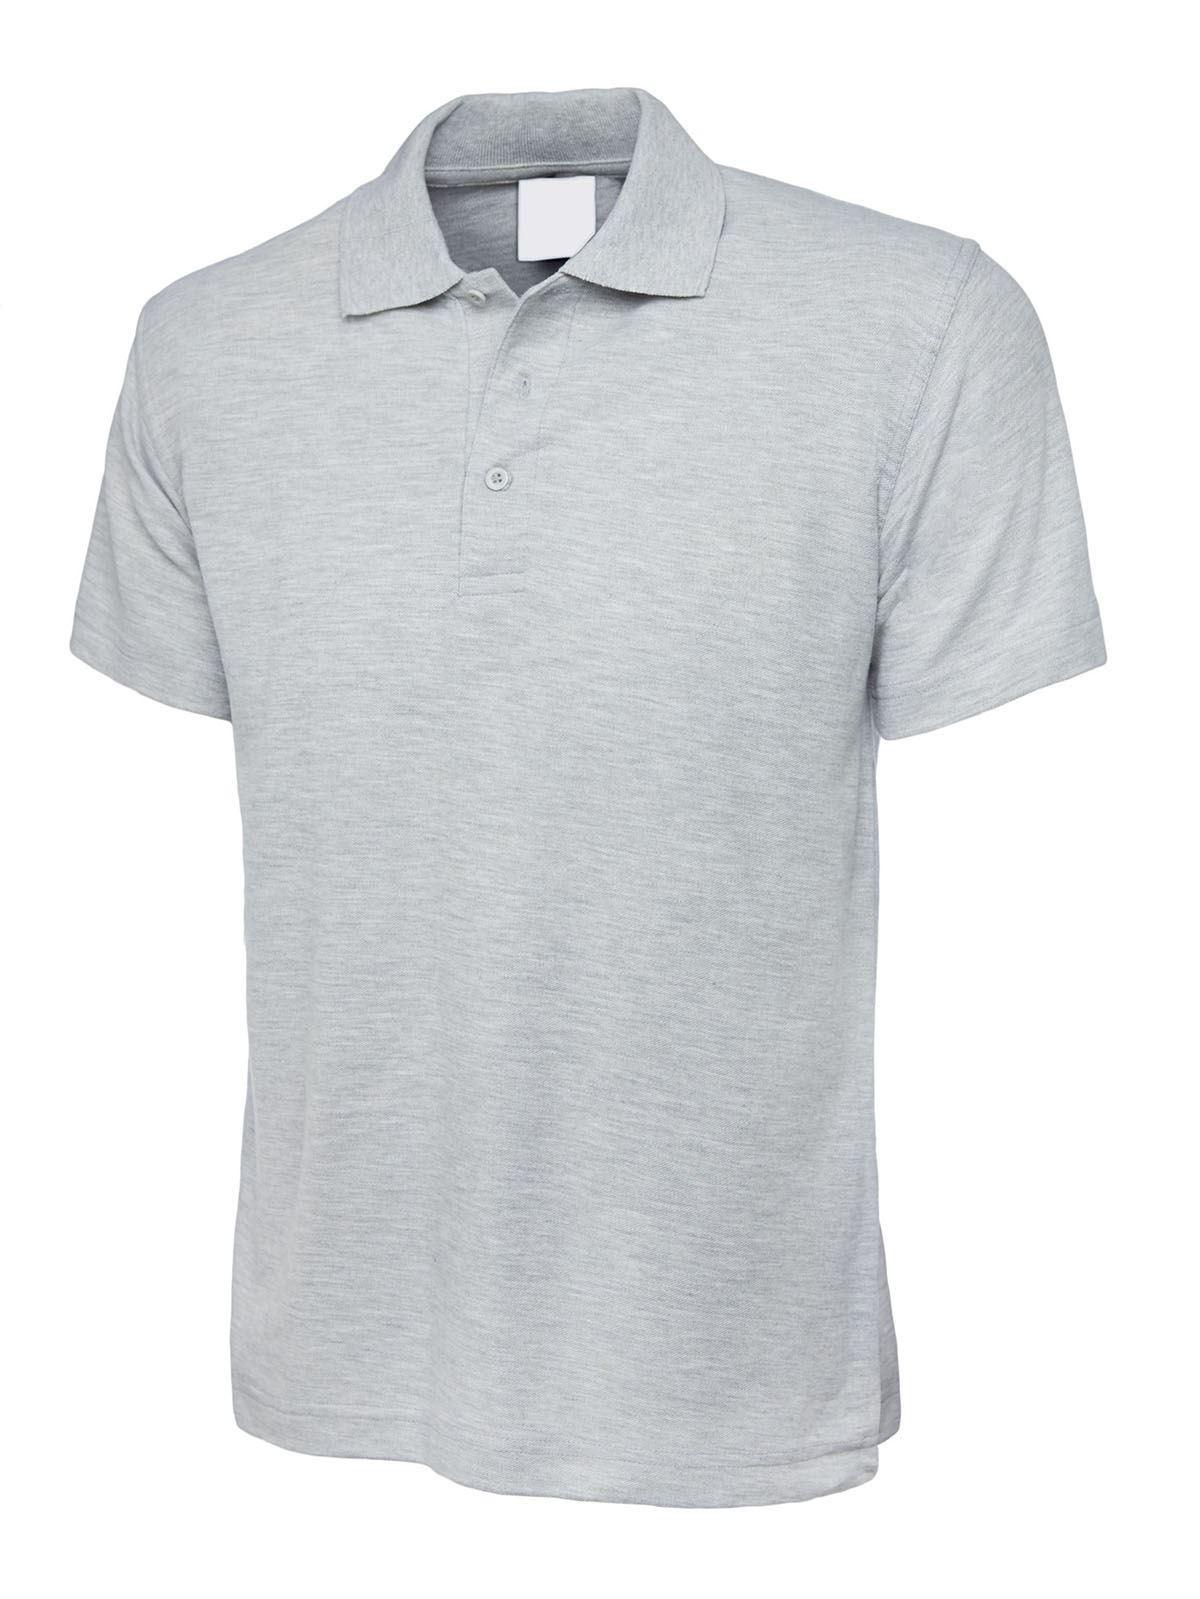 Boys girls polo shirt kids uniform school pe club top for Polo shirt girl addiction